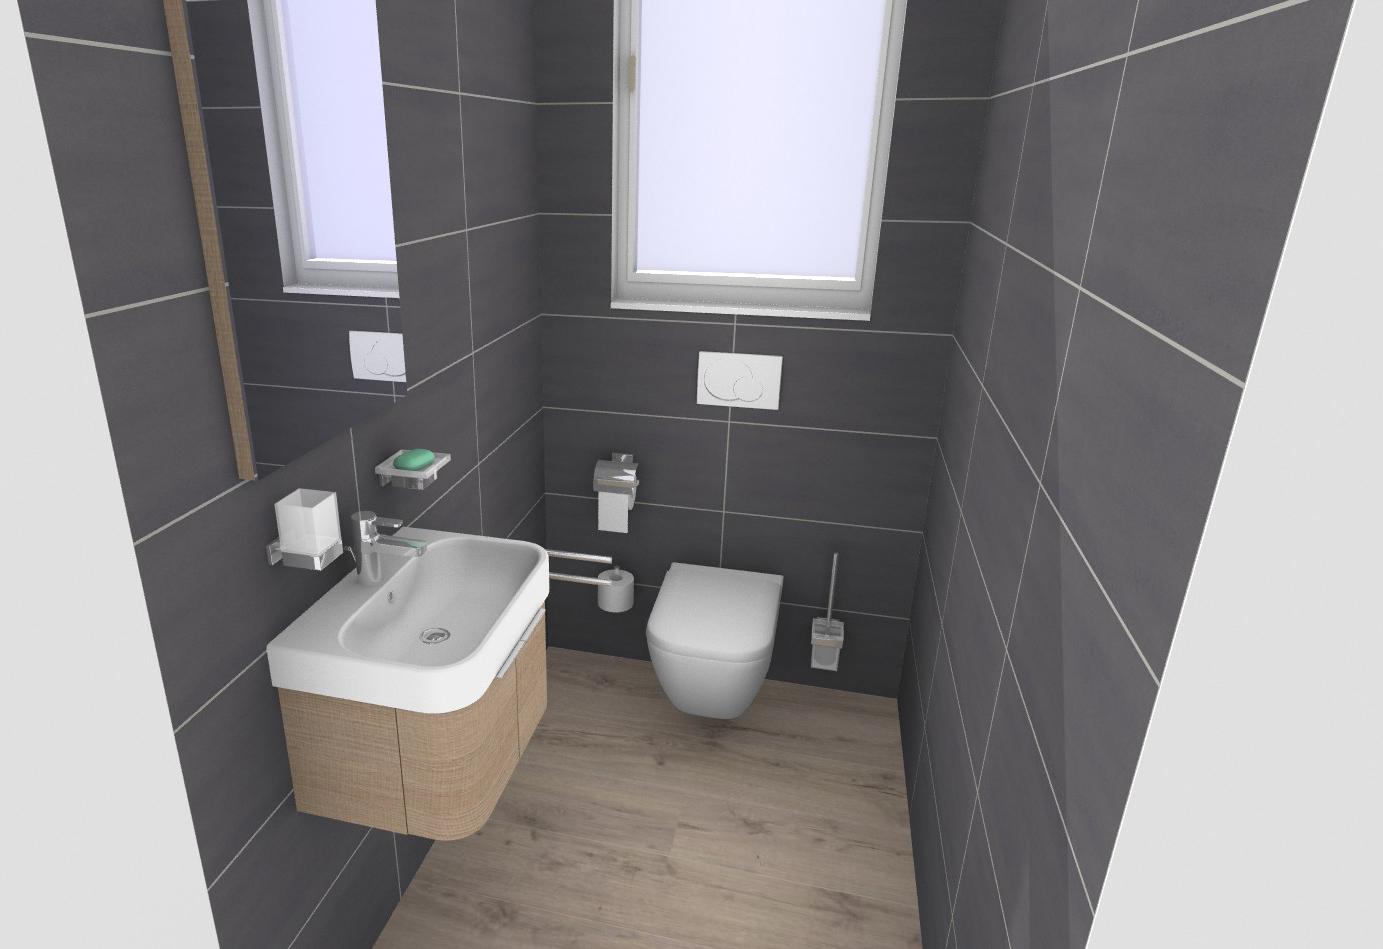 Bathroom planner duravit for Bathroom planner uk